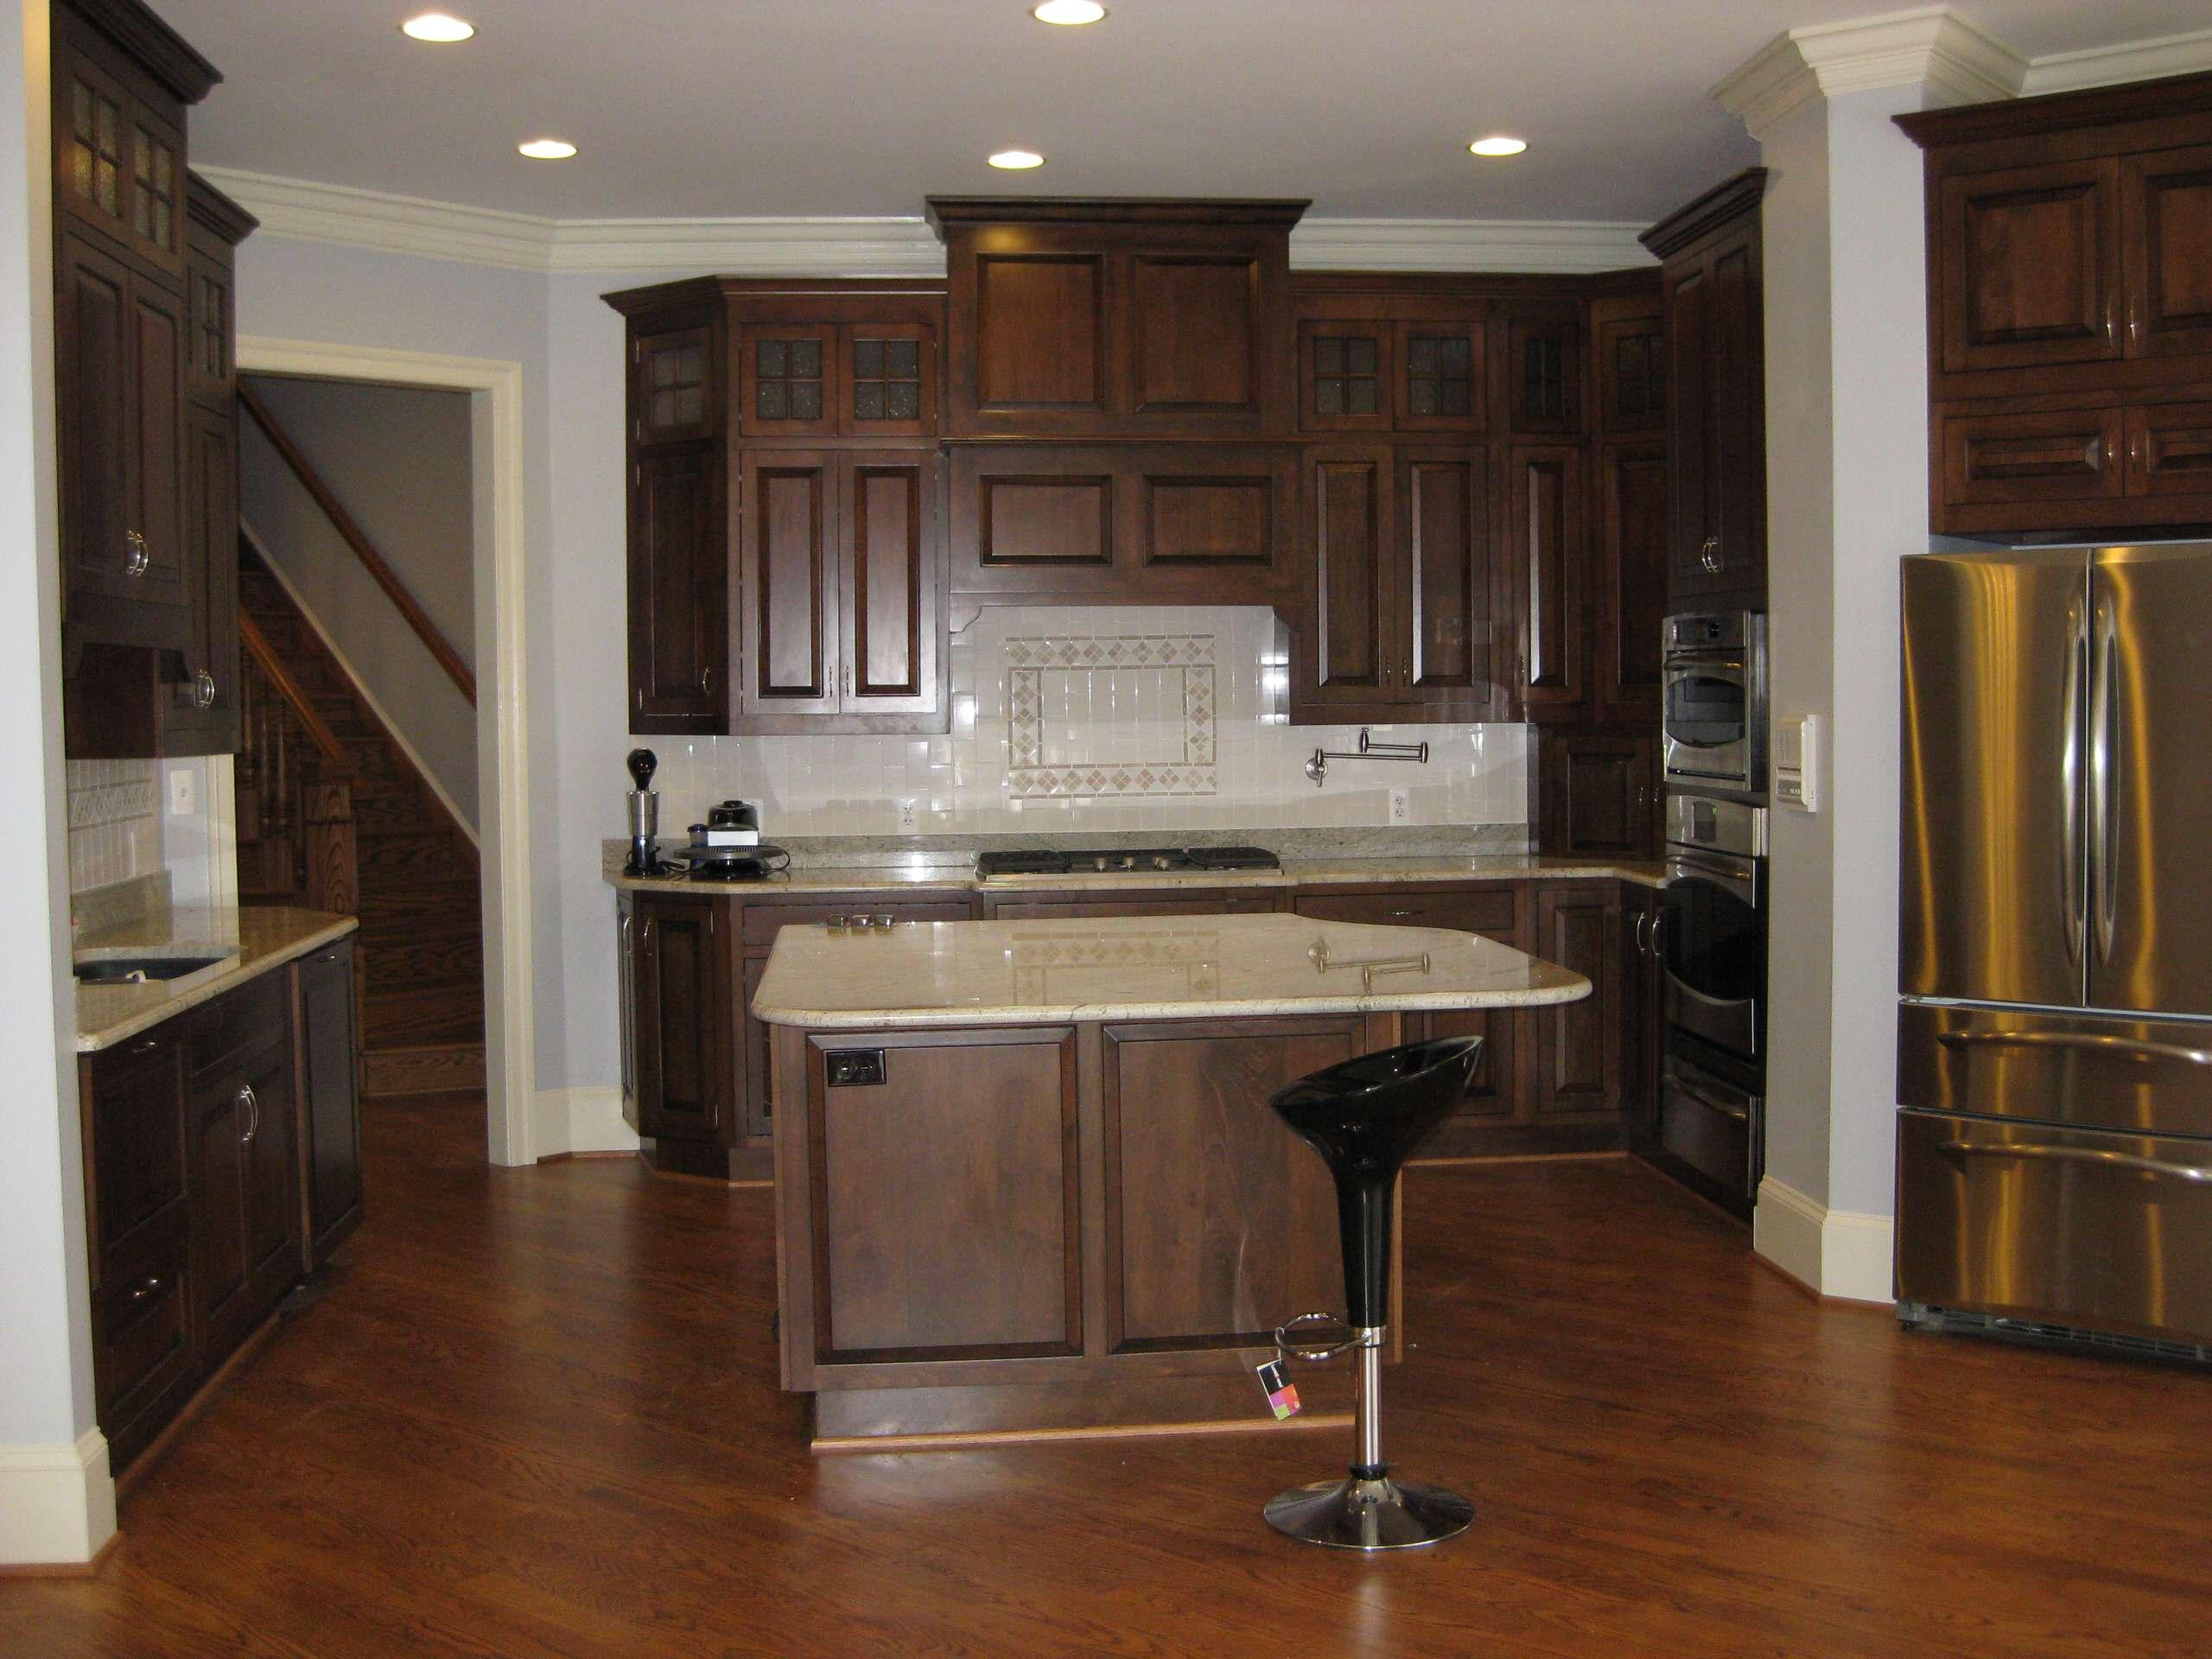 new build kitchen Cosmic White Granite, dark brown cabinets- Falls Church